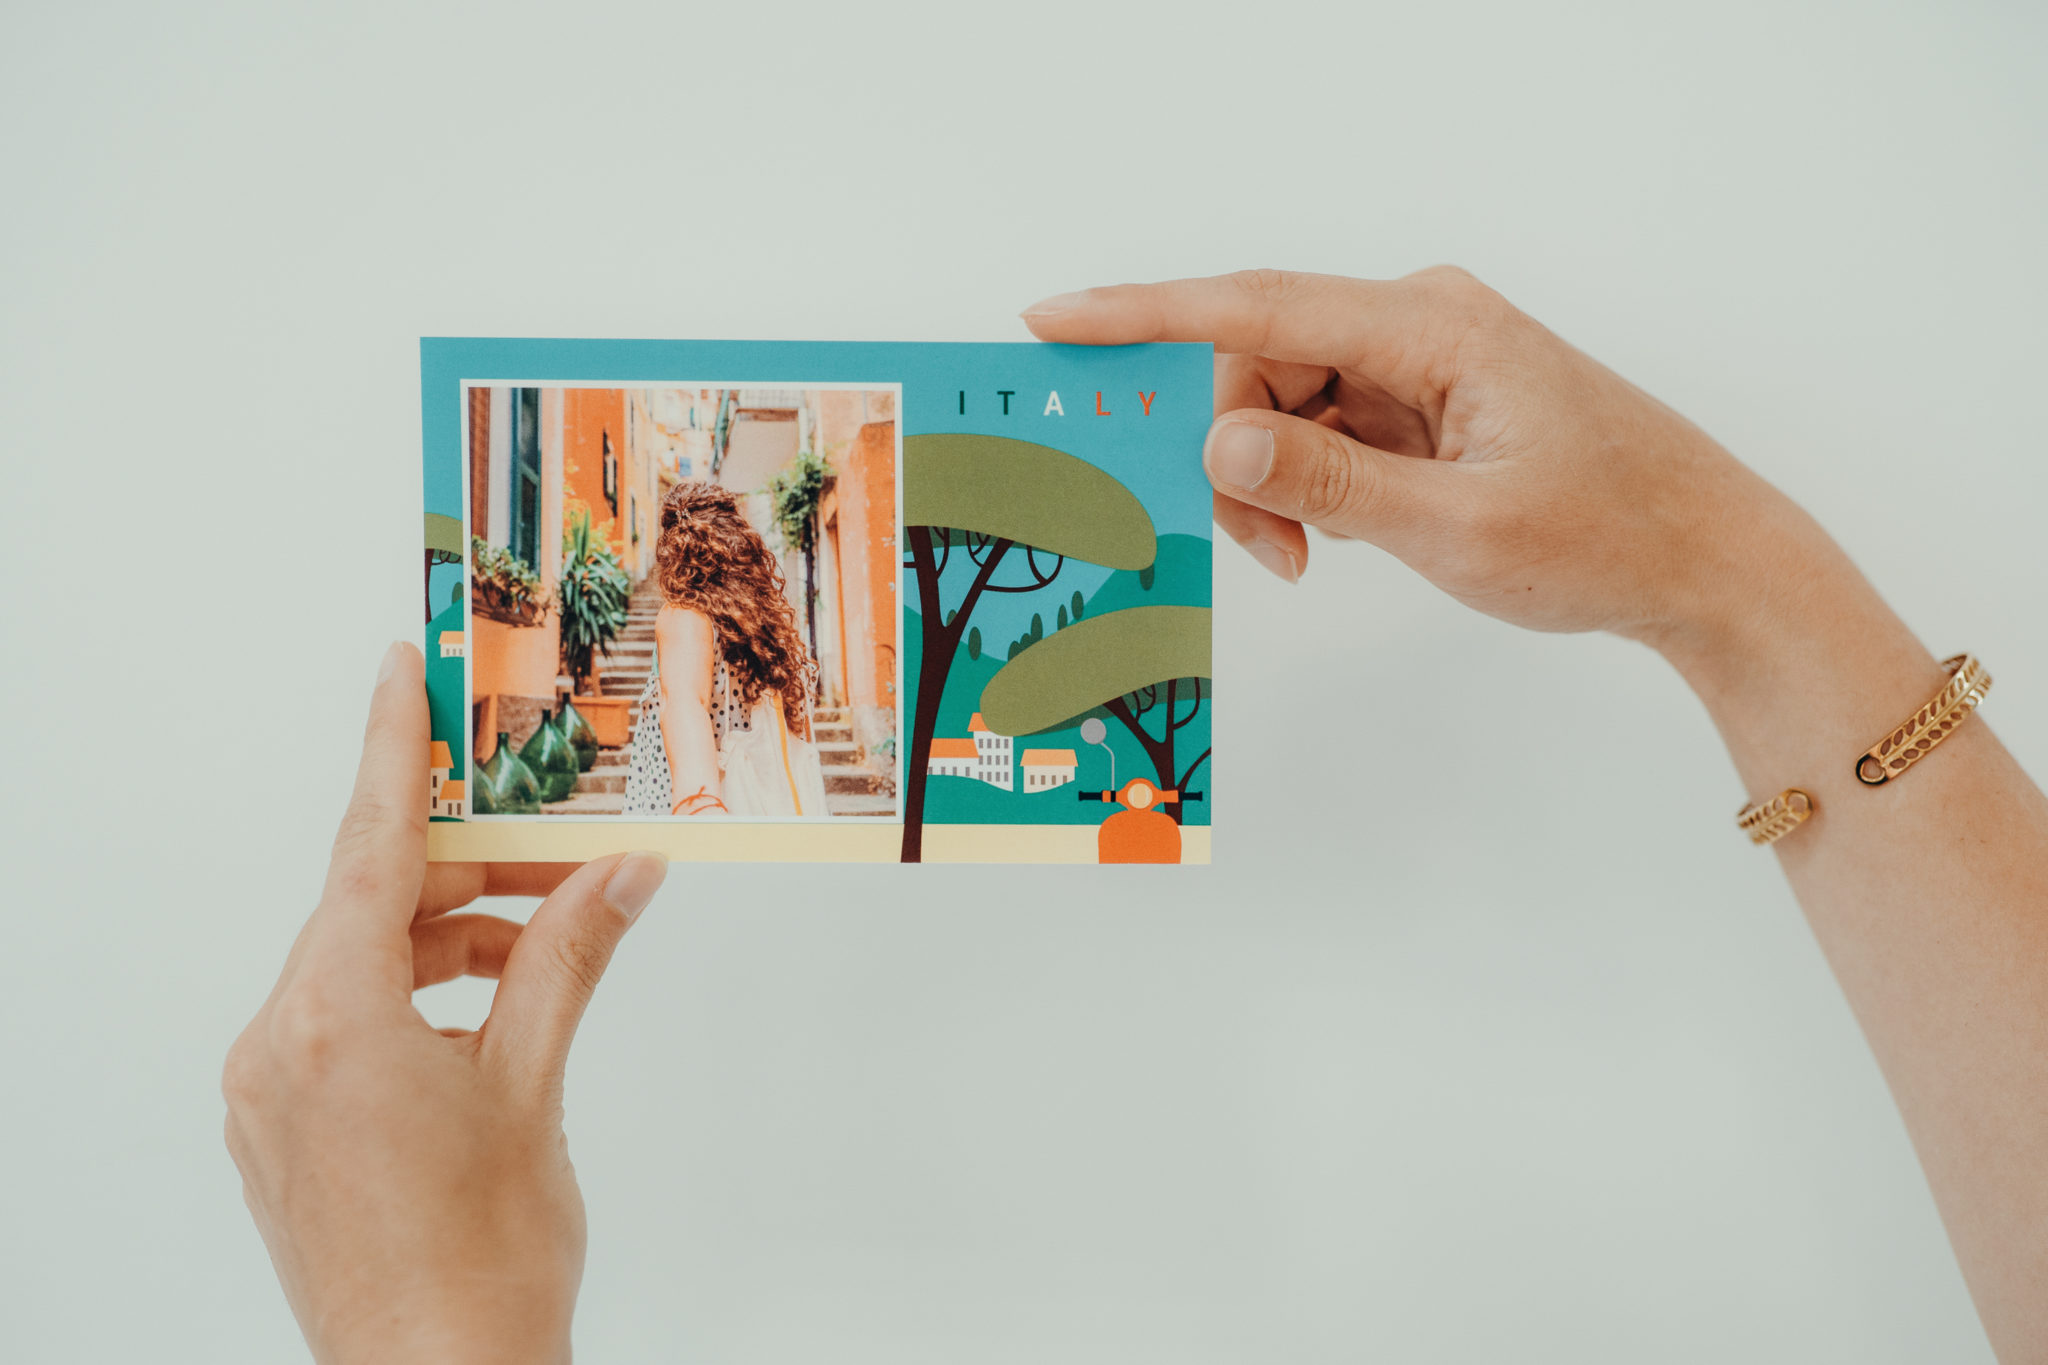 italie vacances carte postale